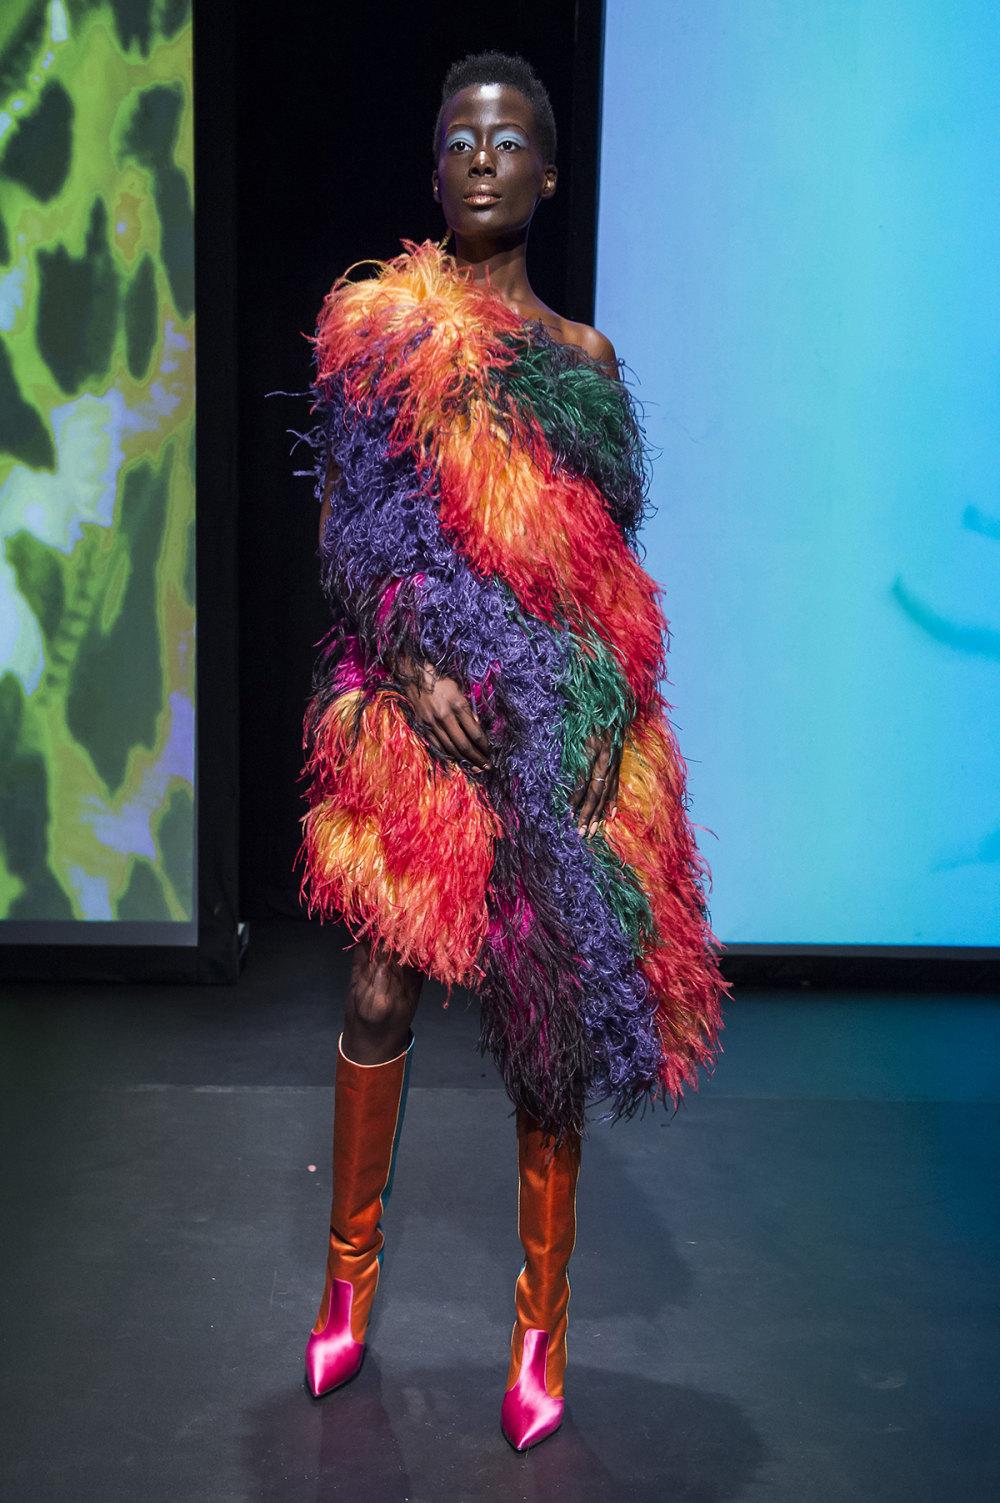 16Arlington时装系列标志性的時尚单色西装外还有更大胆的版本-18.jpg